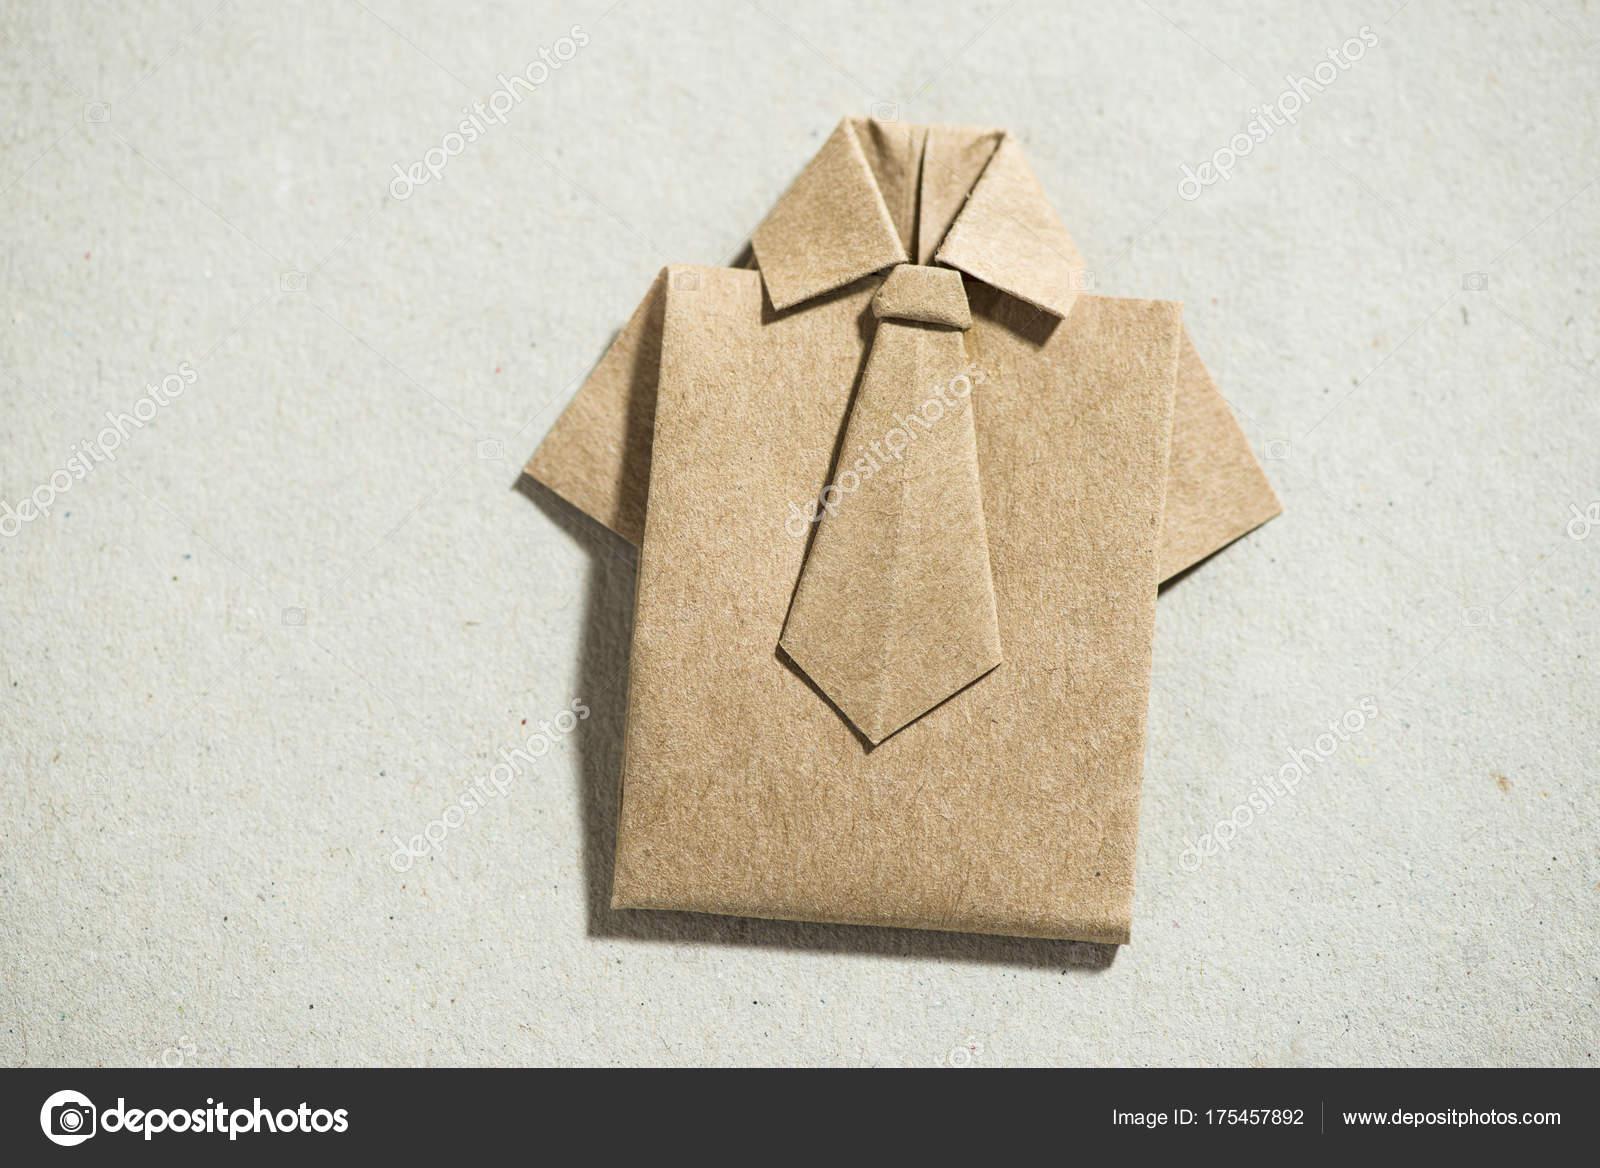 Сорочка орігамі папері — Стокове фото — білий © degimages  175457892 aa896de3a19ef